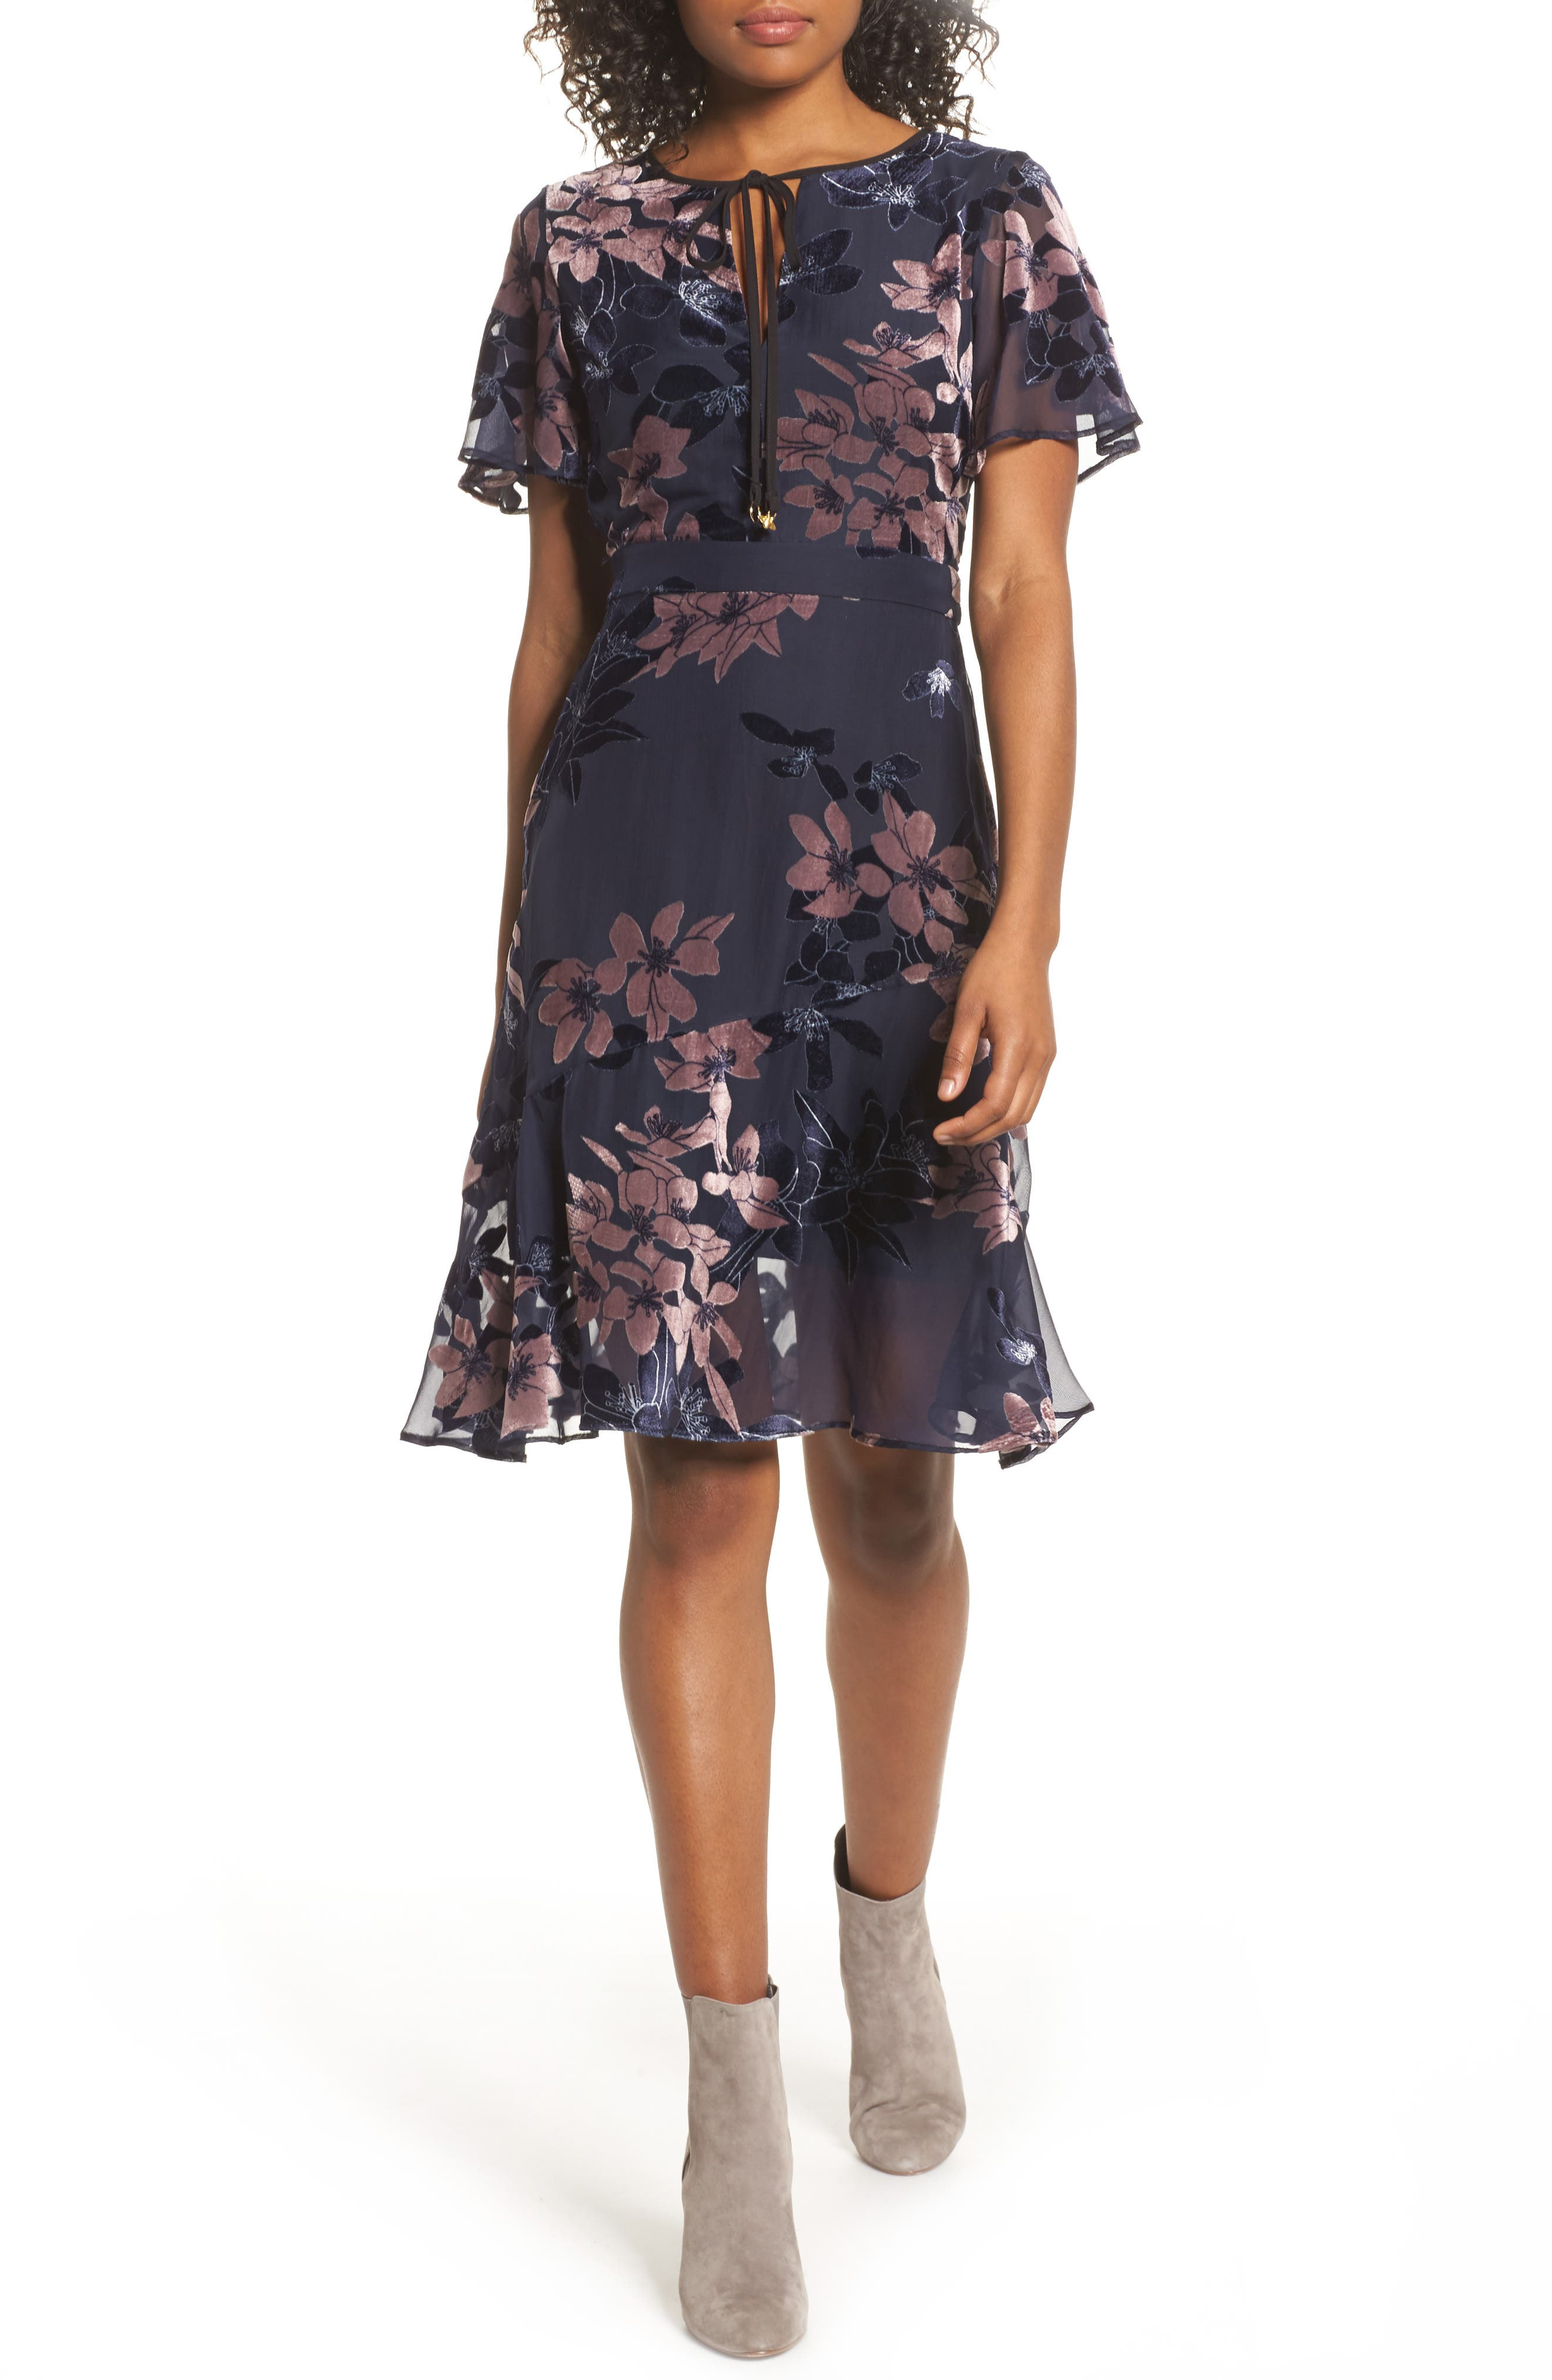 55486a2ac7 Women s Sam Edelman Dresses